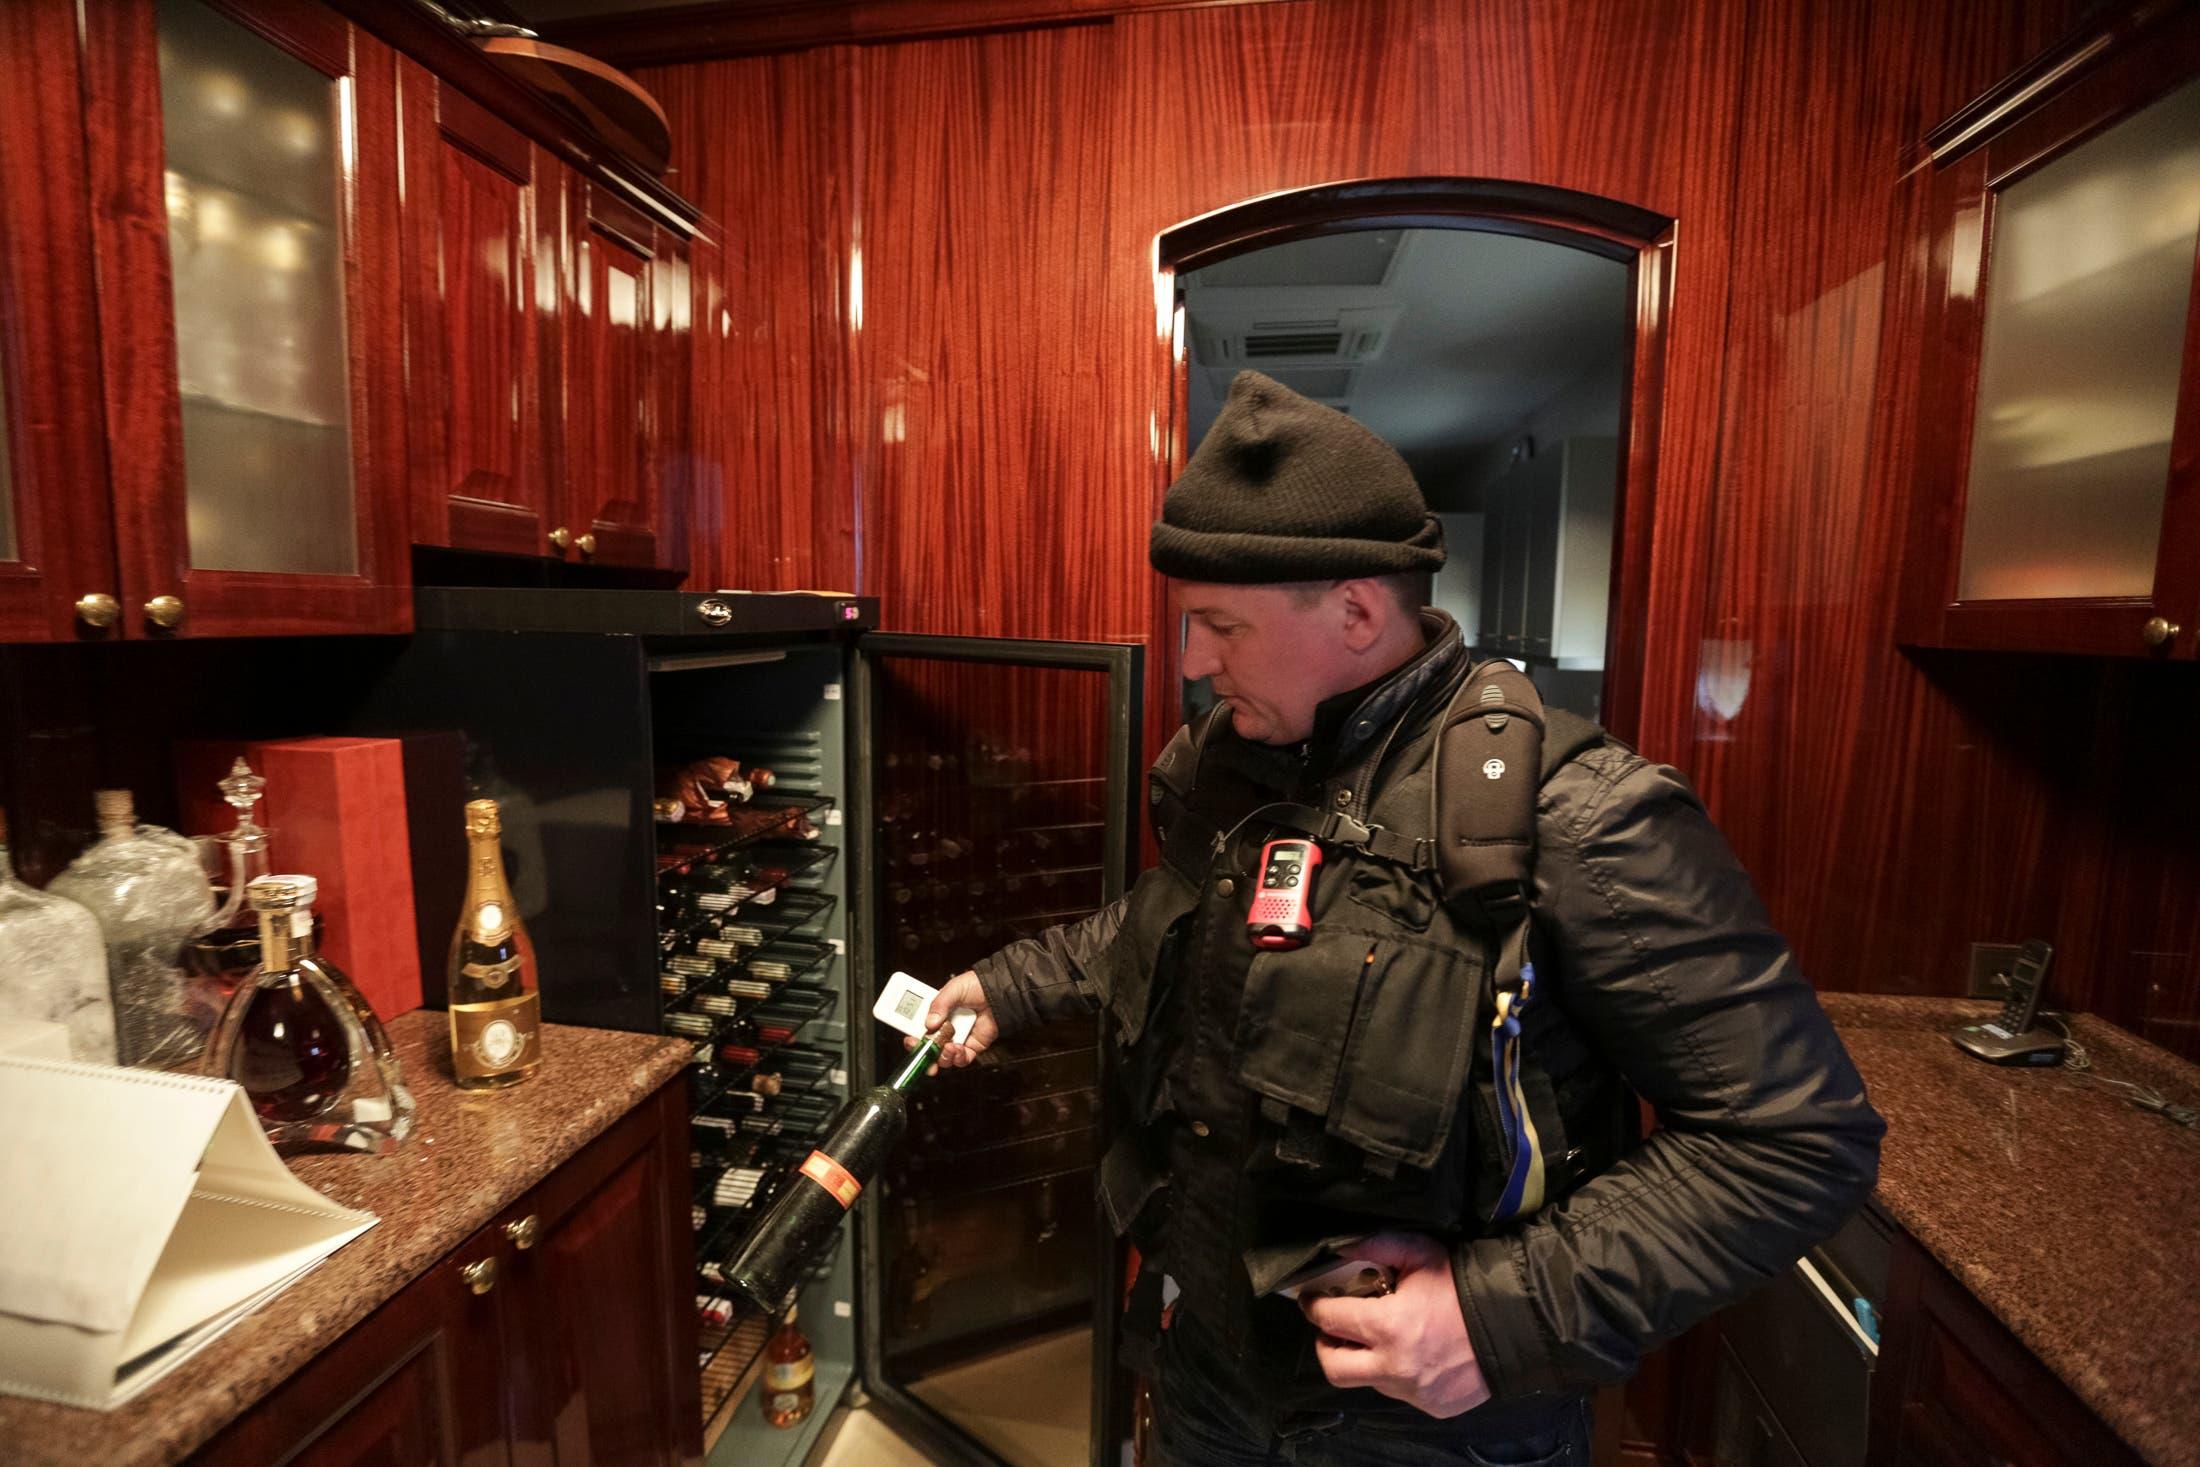 Yanukovych's shocking opulence revealed